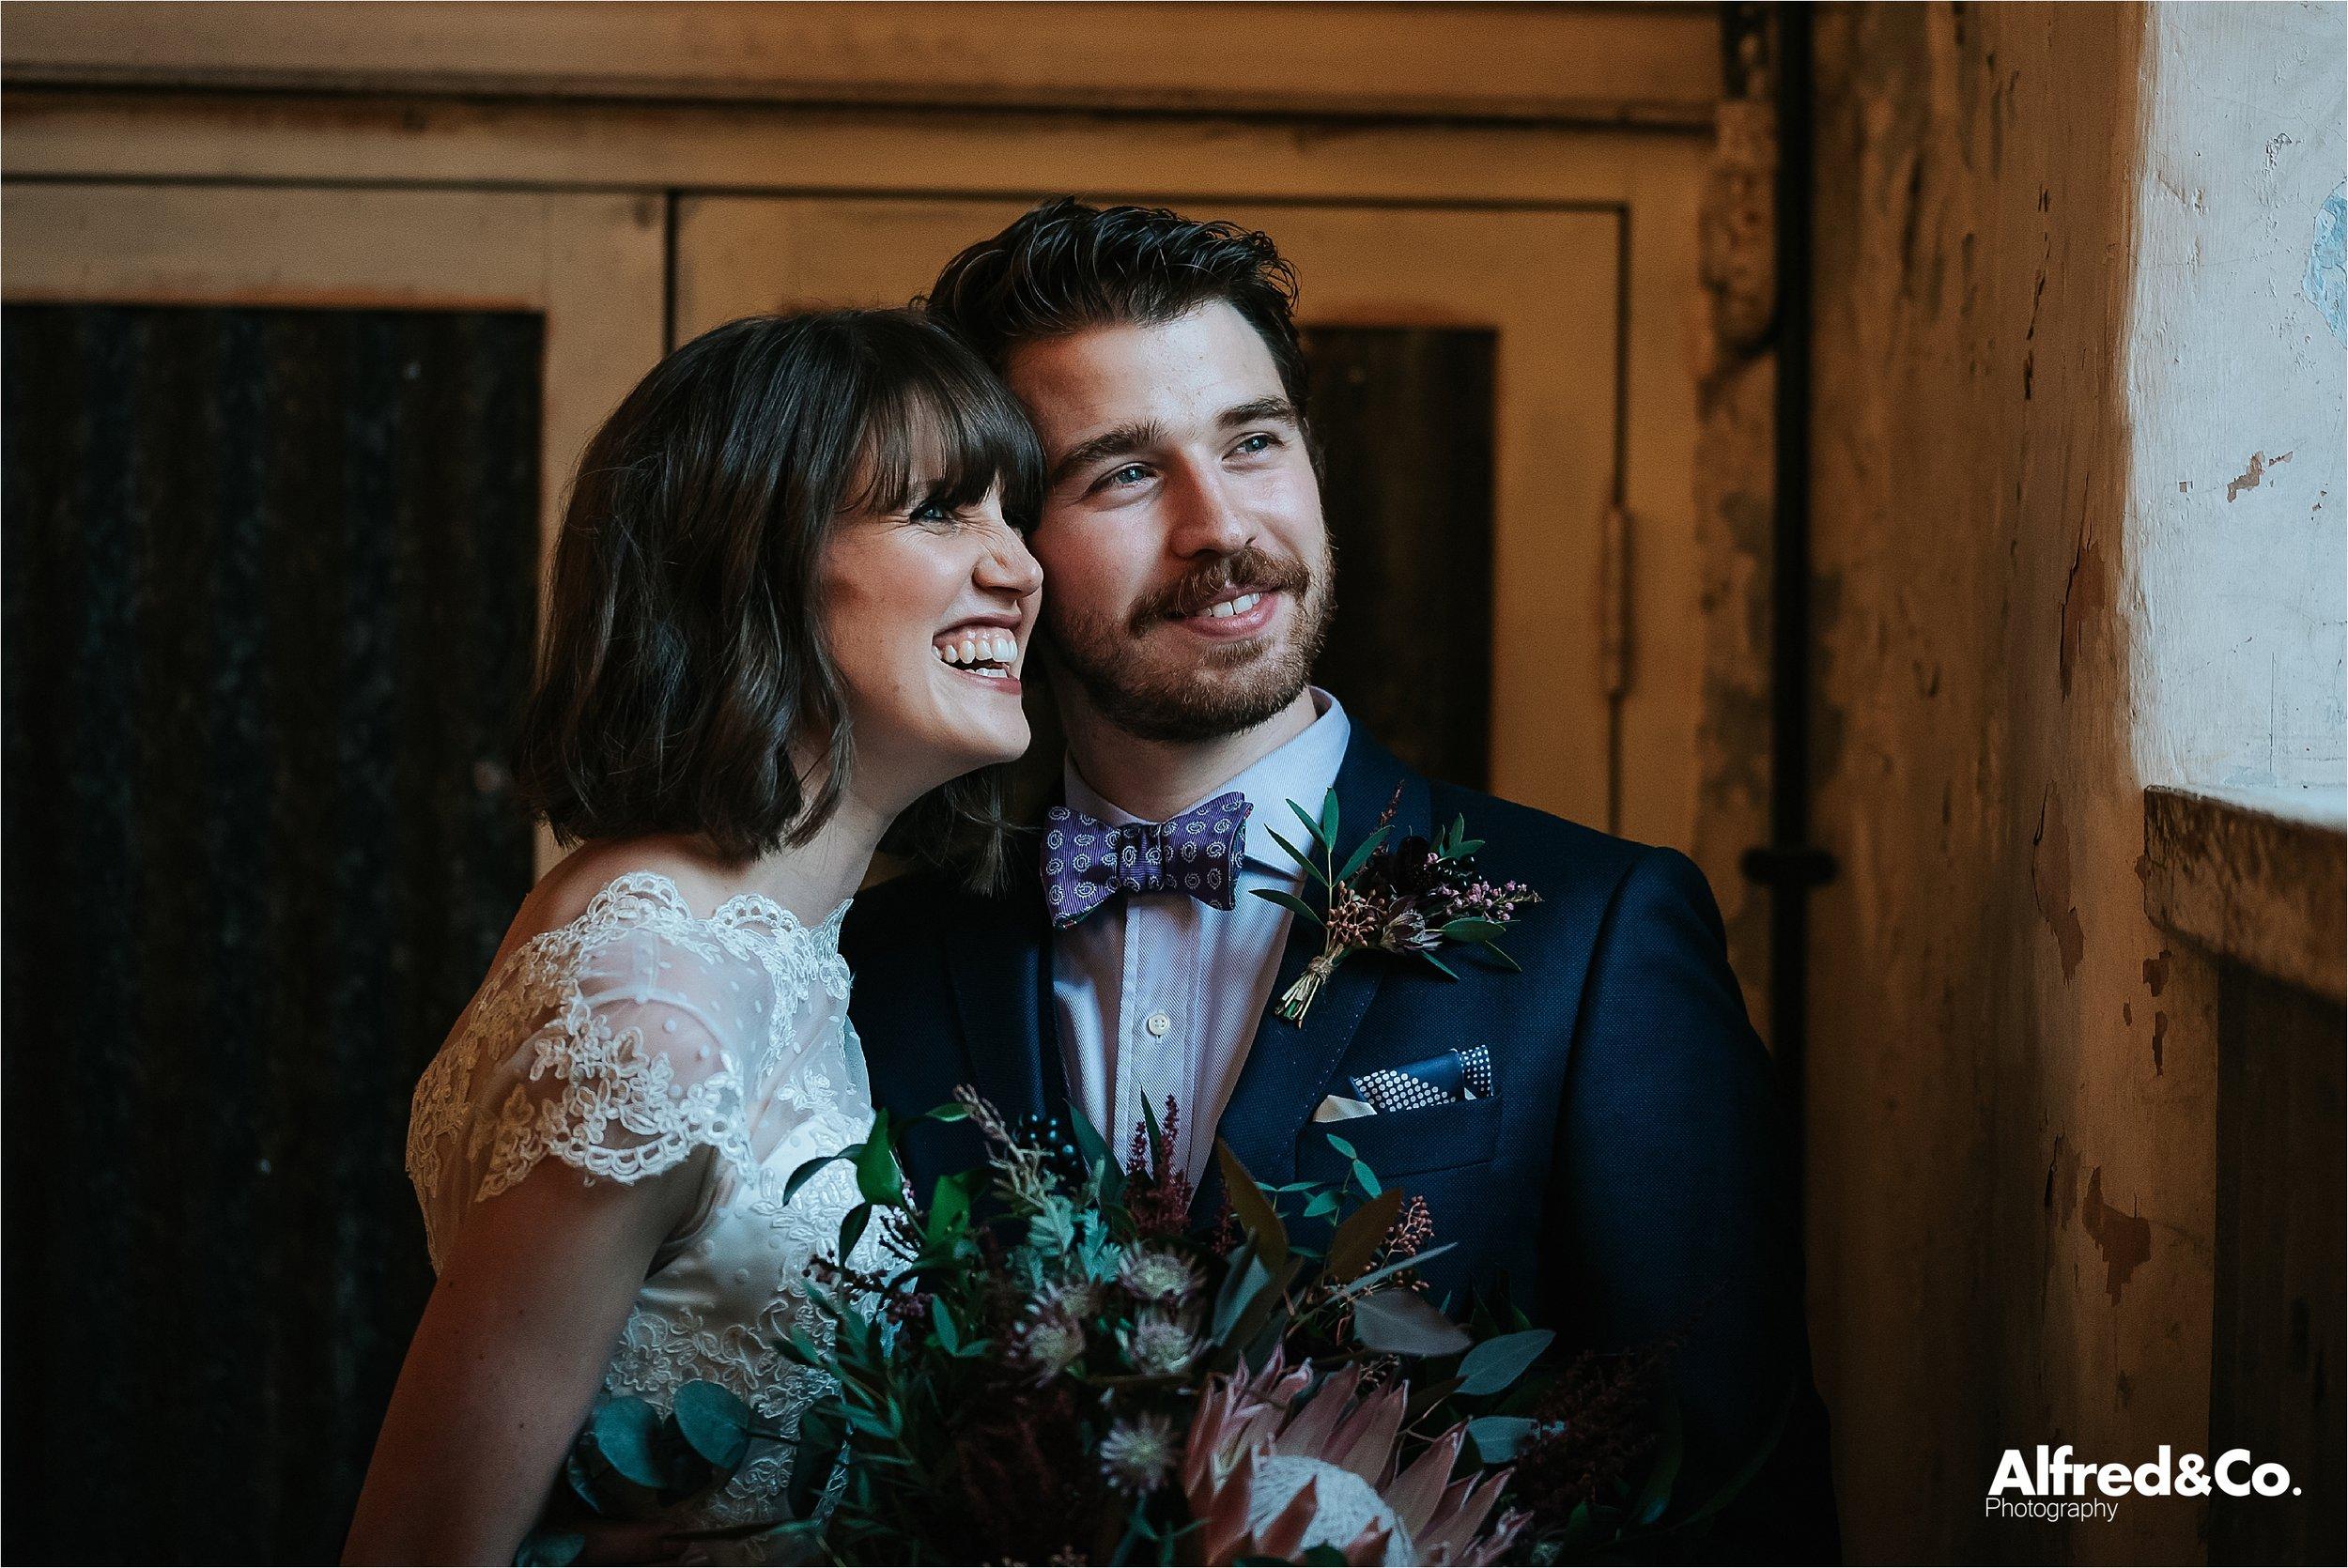 holmesmill+wedding+clitheroe+photographer+rustic+lancashire4.jpg